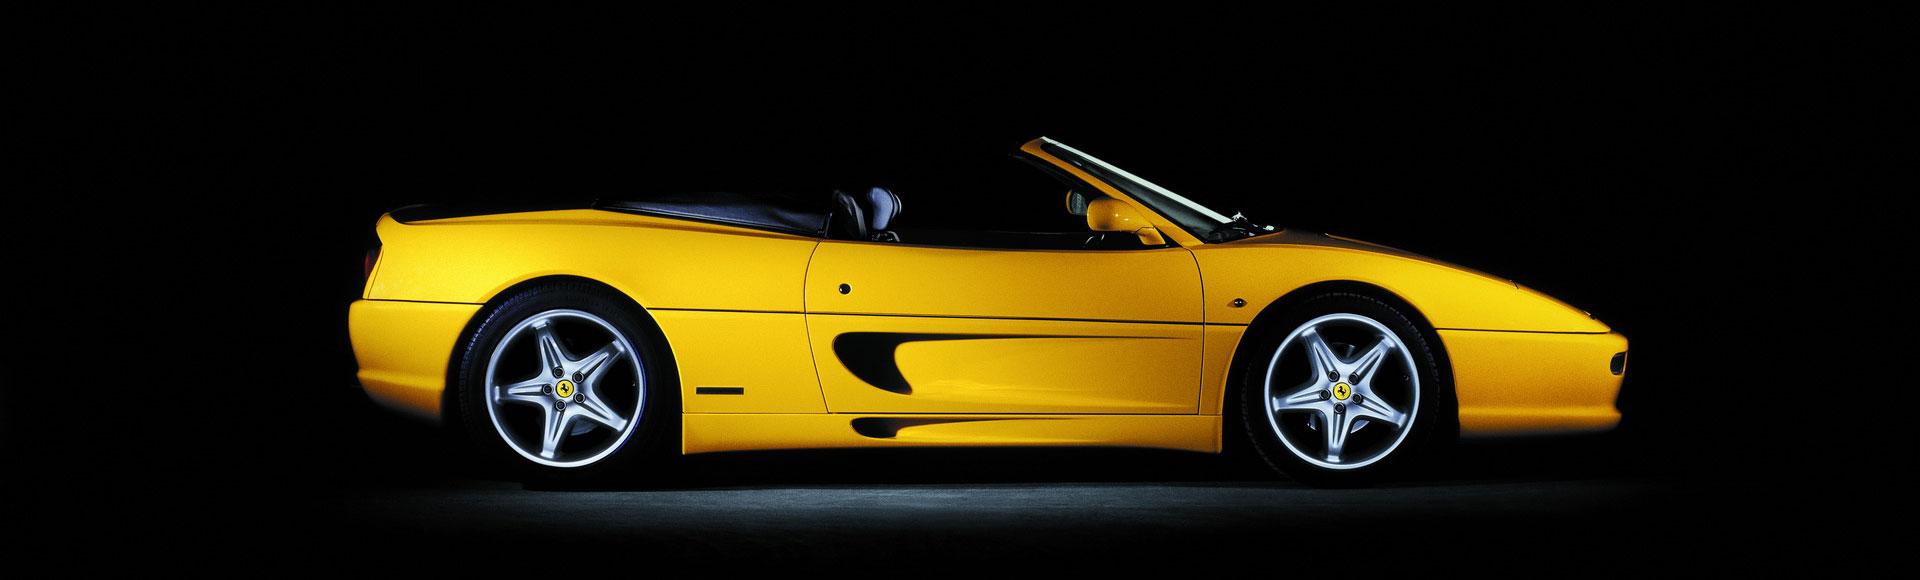 Ferrari 2004 X Edition